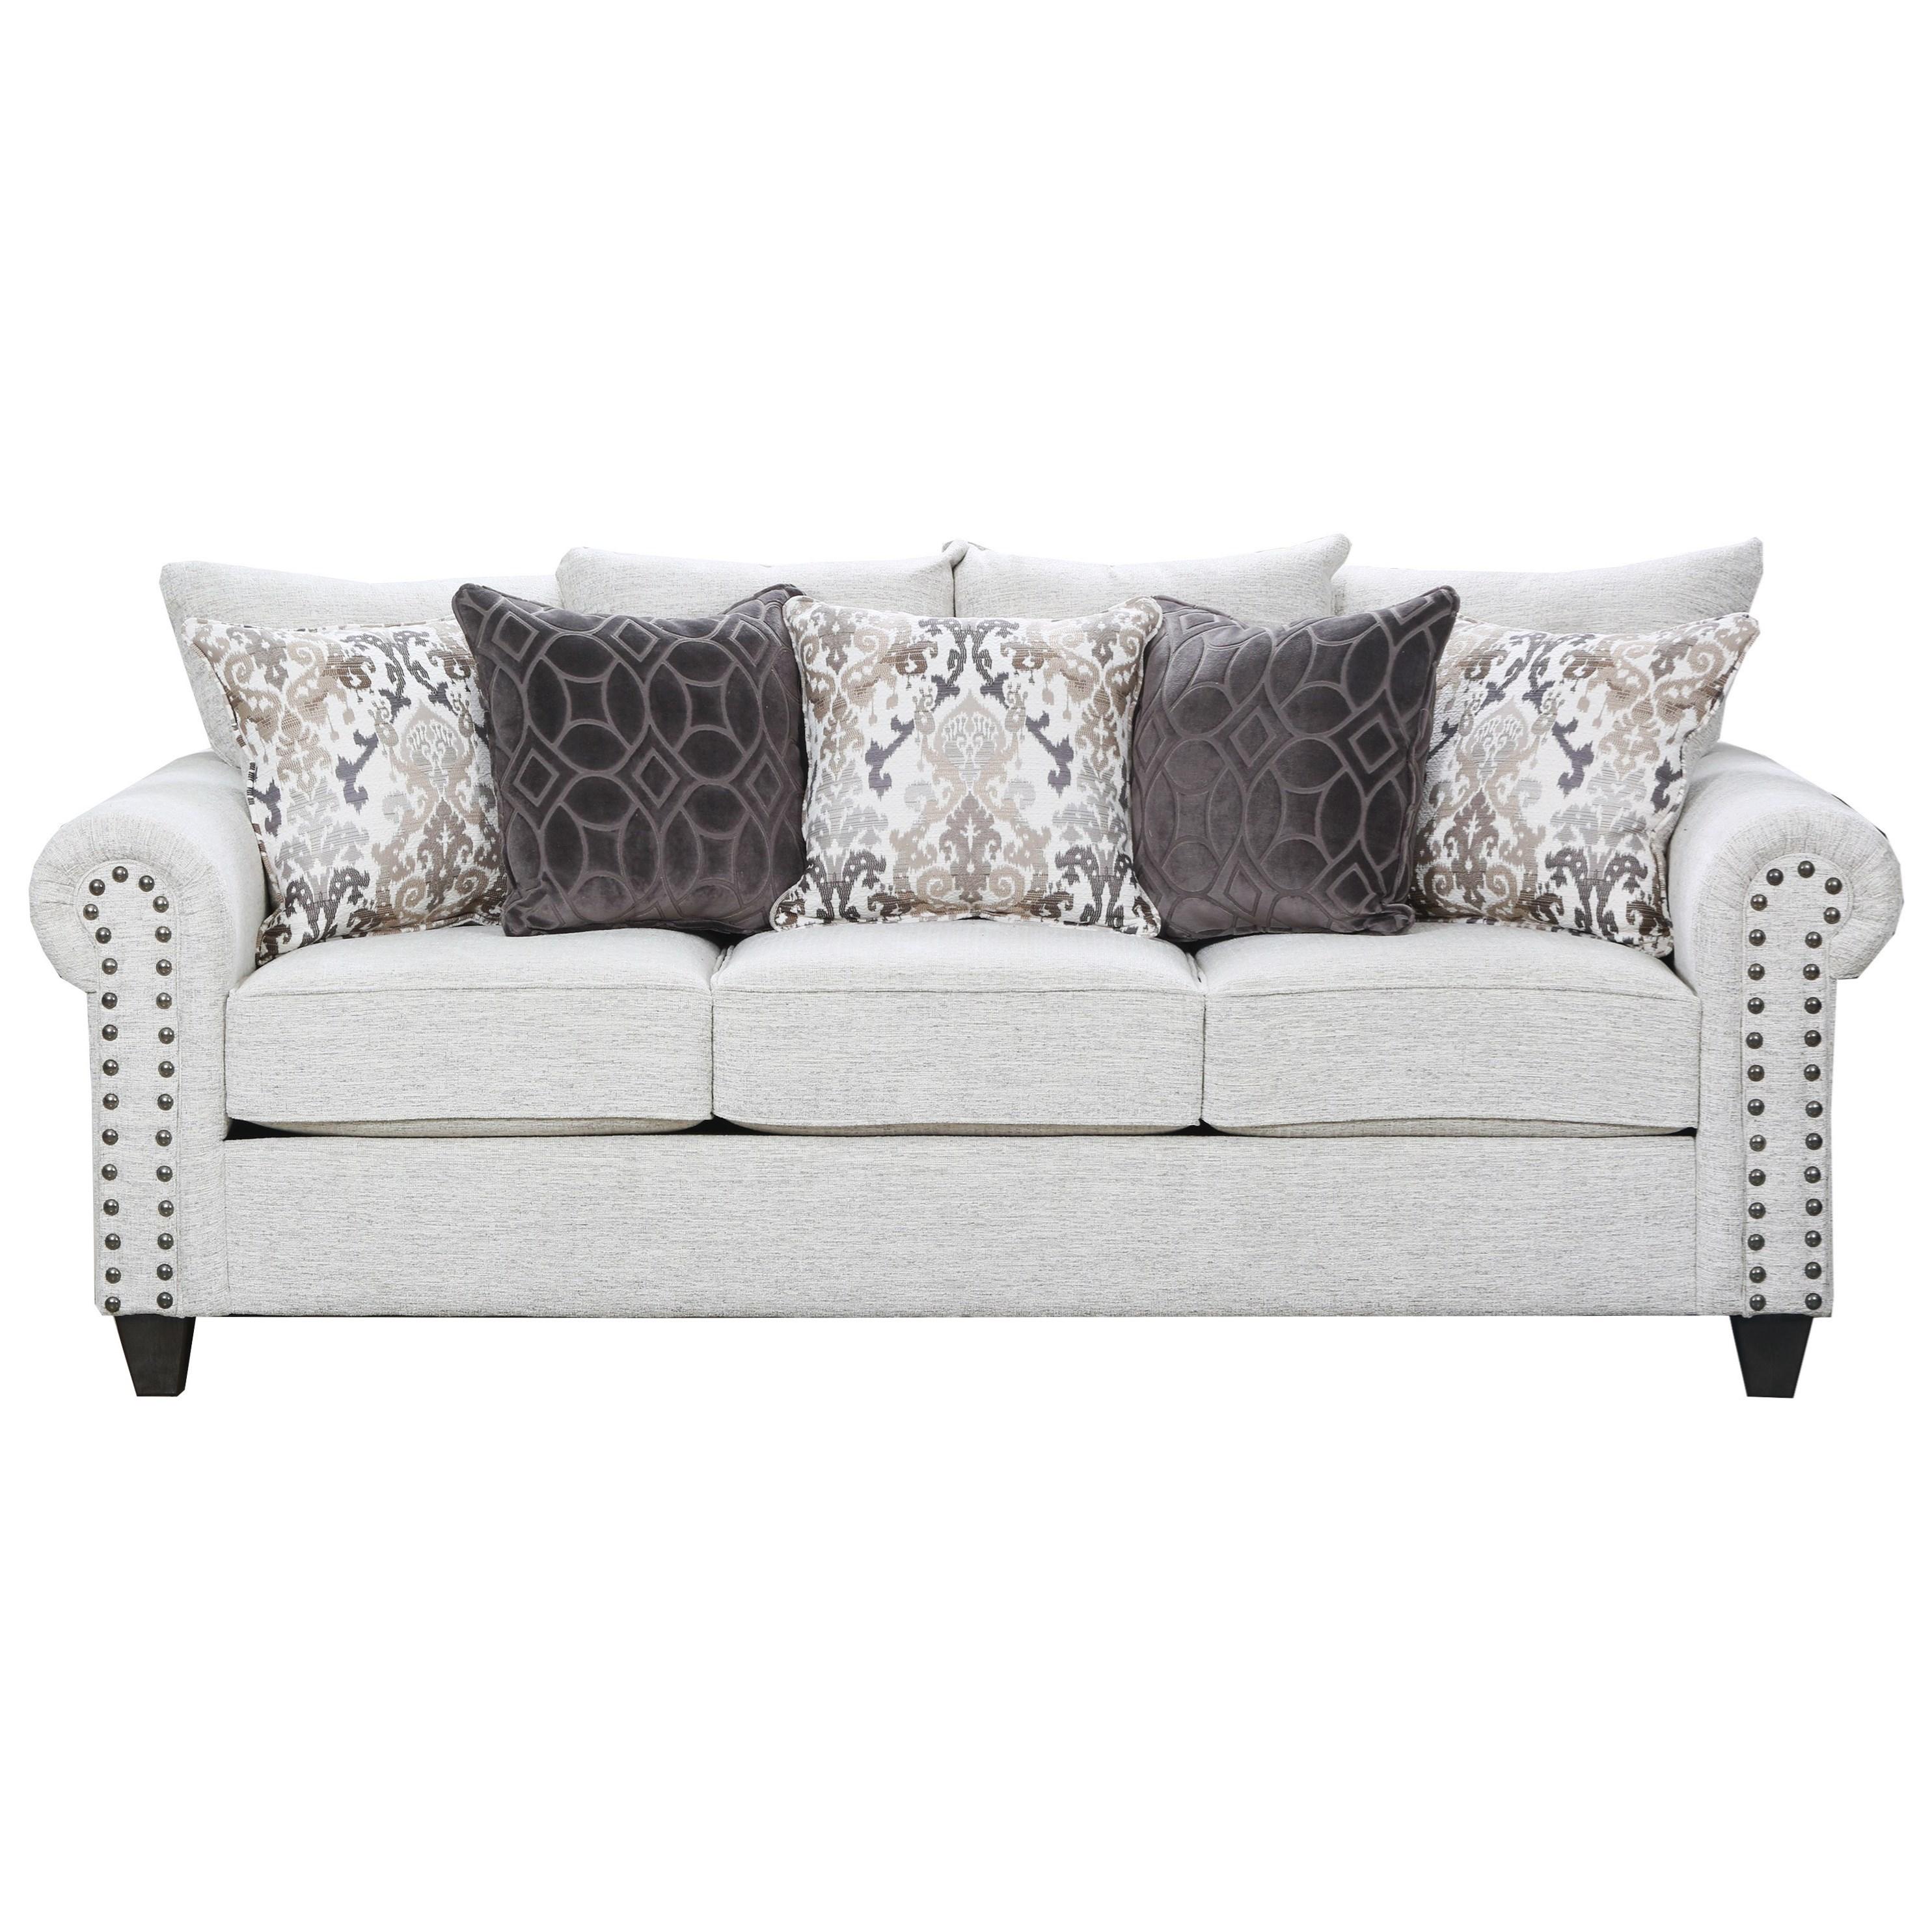 United Furniture Industries 9175BR Sofa - Item Number: 9175BRSOFA-Della Linen